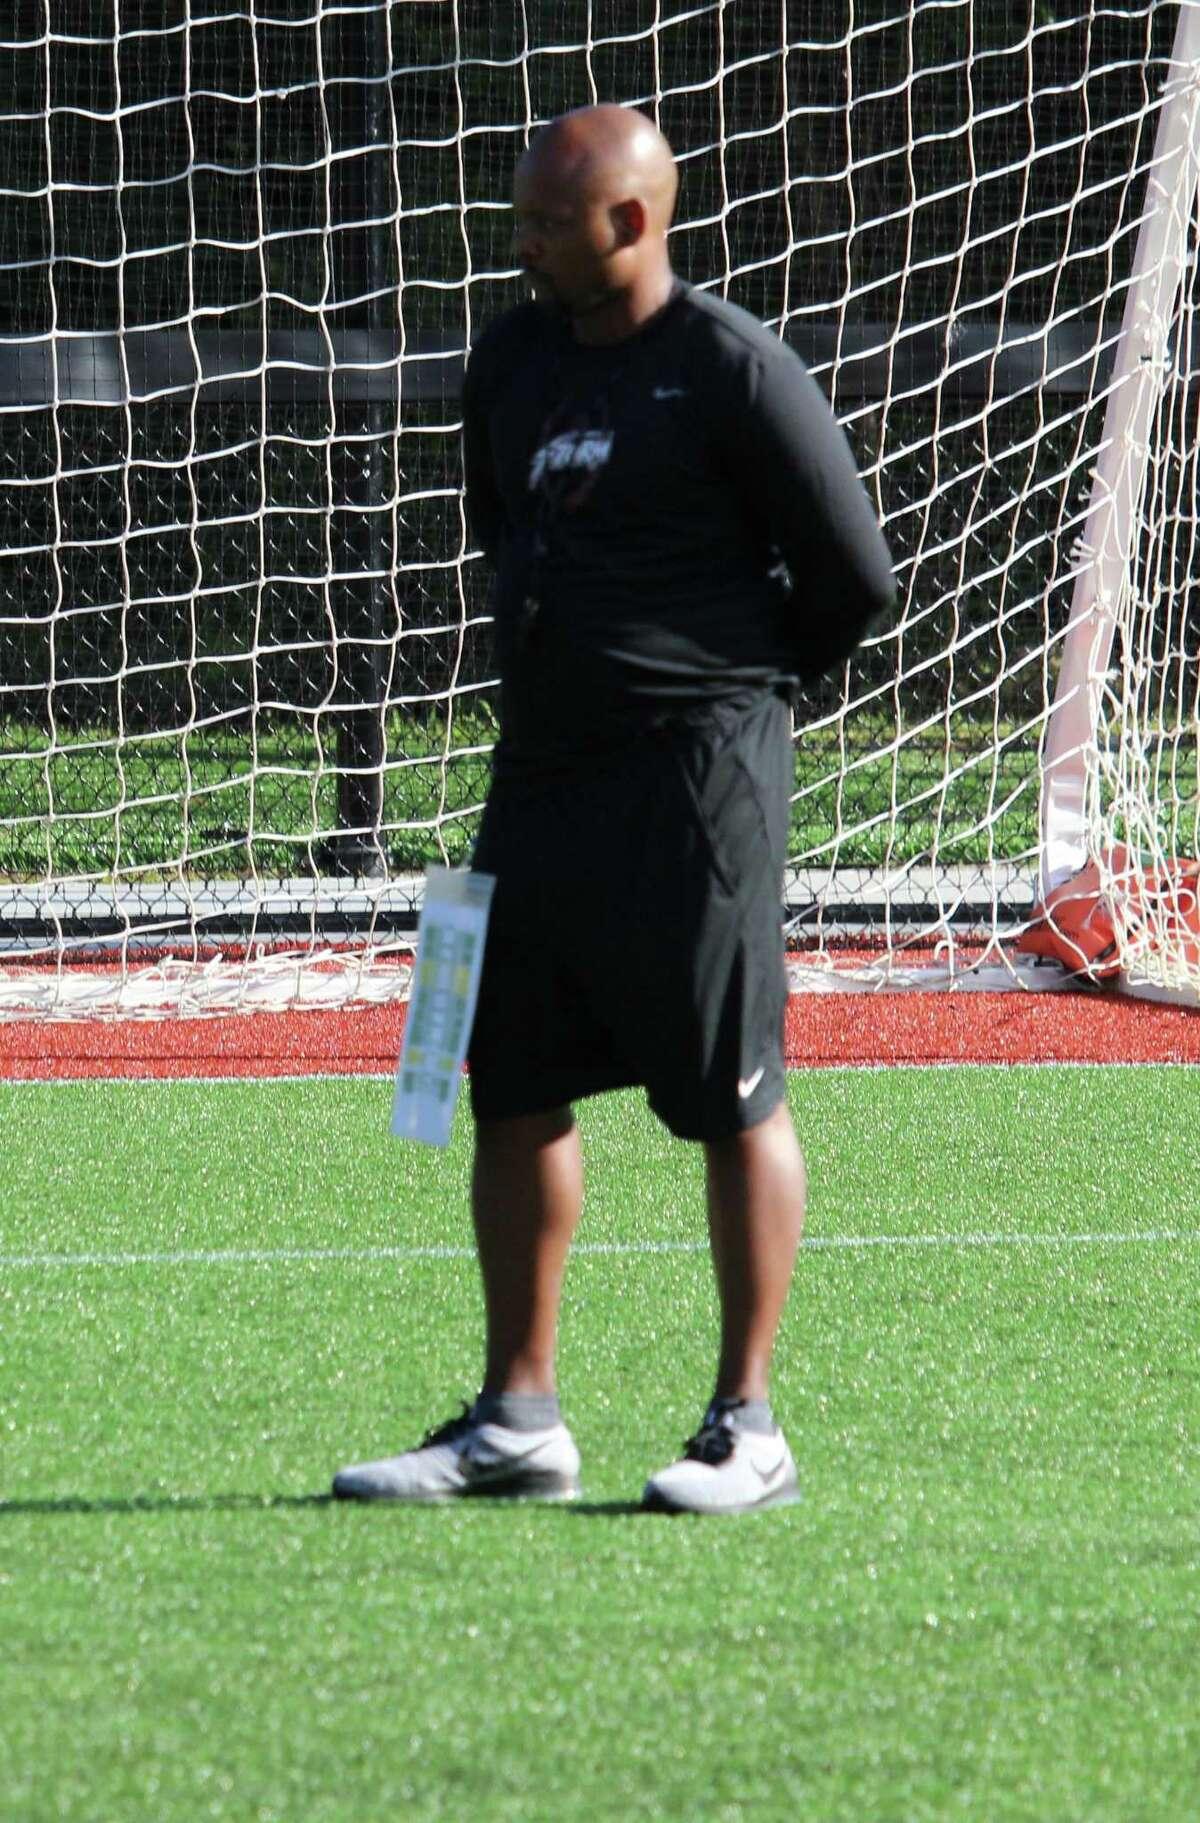 St. Luke's coach Noel Thomas looks on during practice.